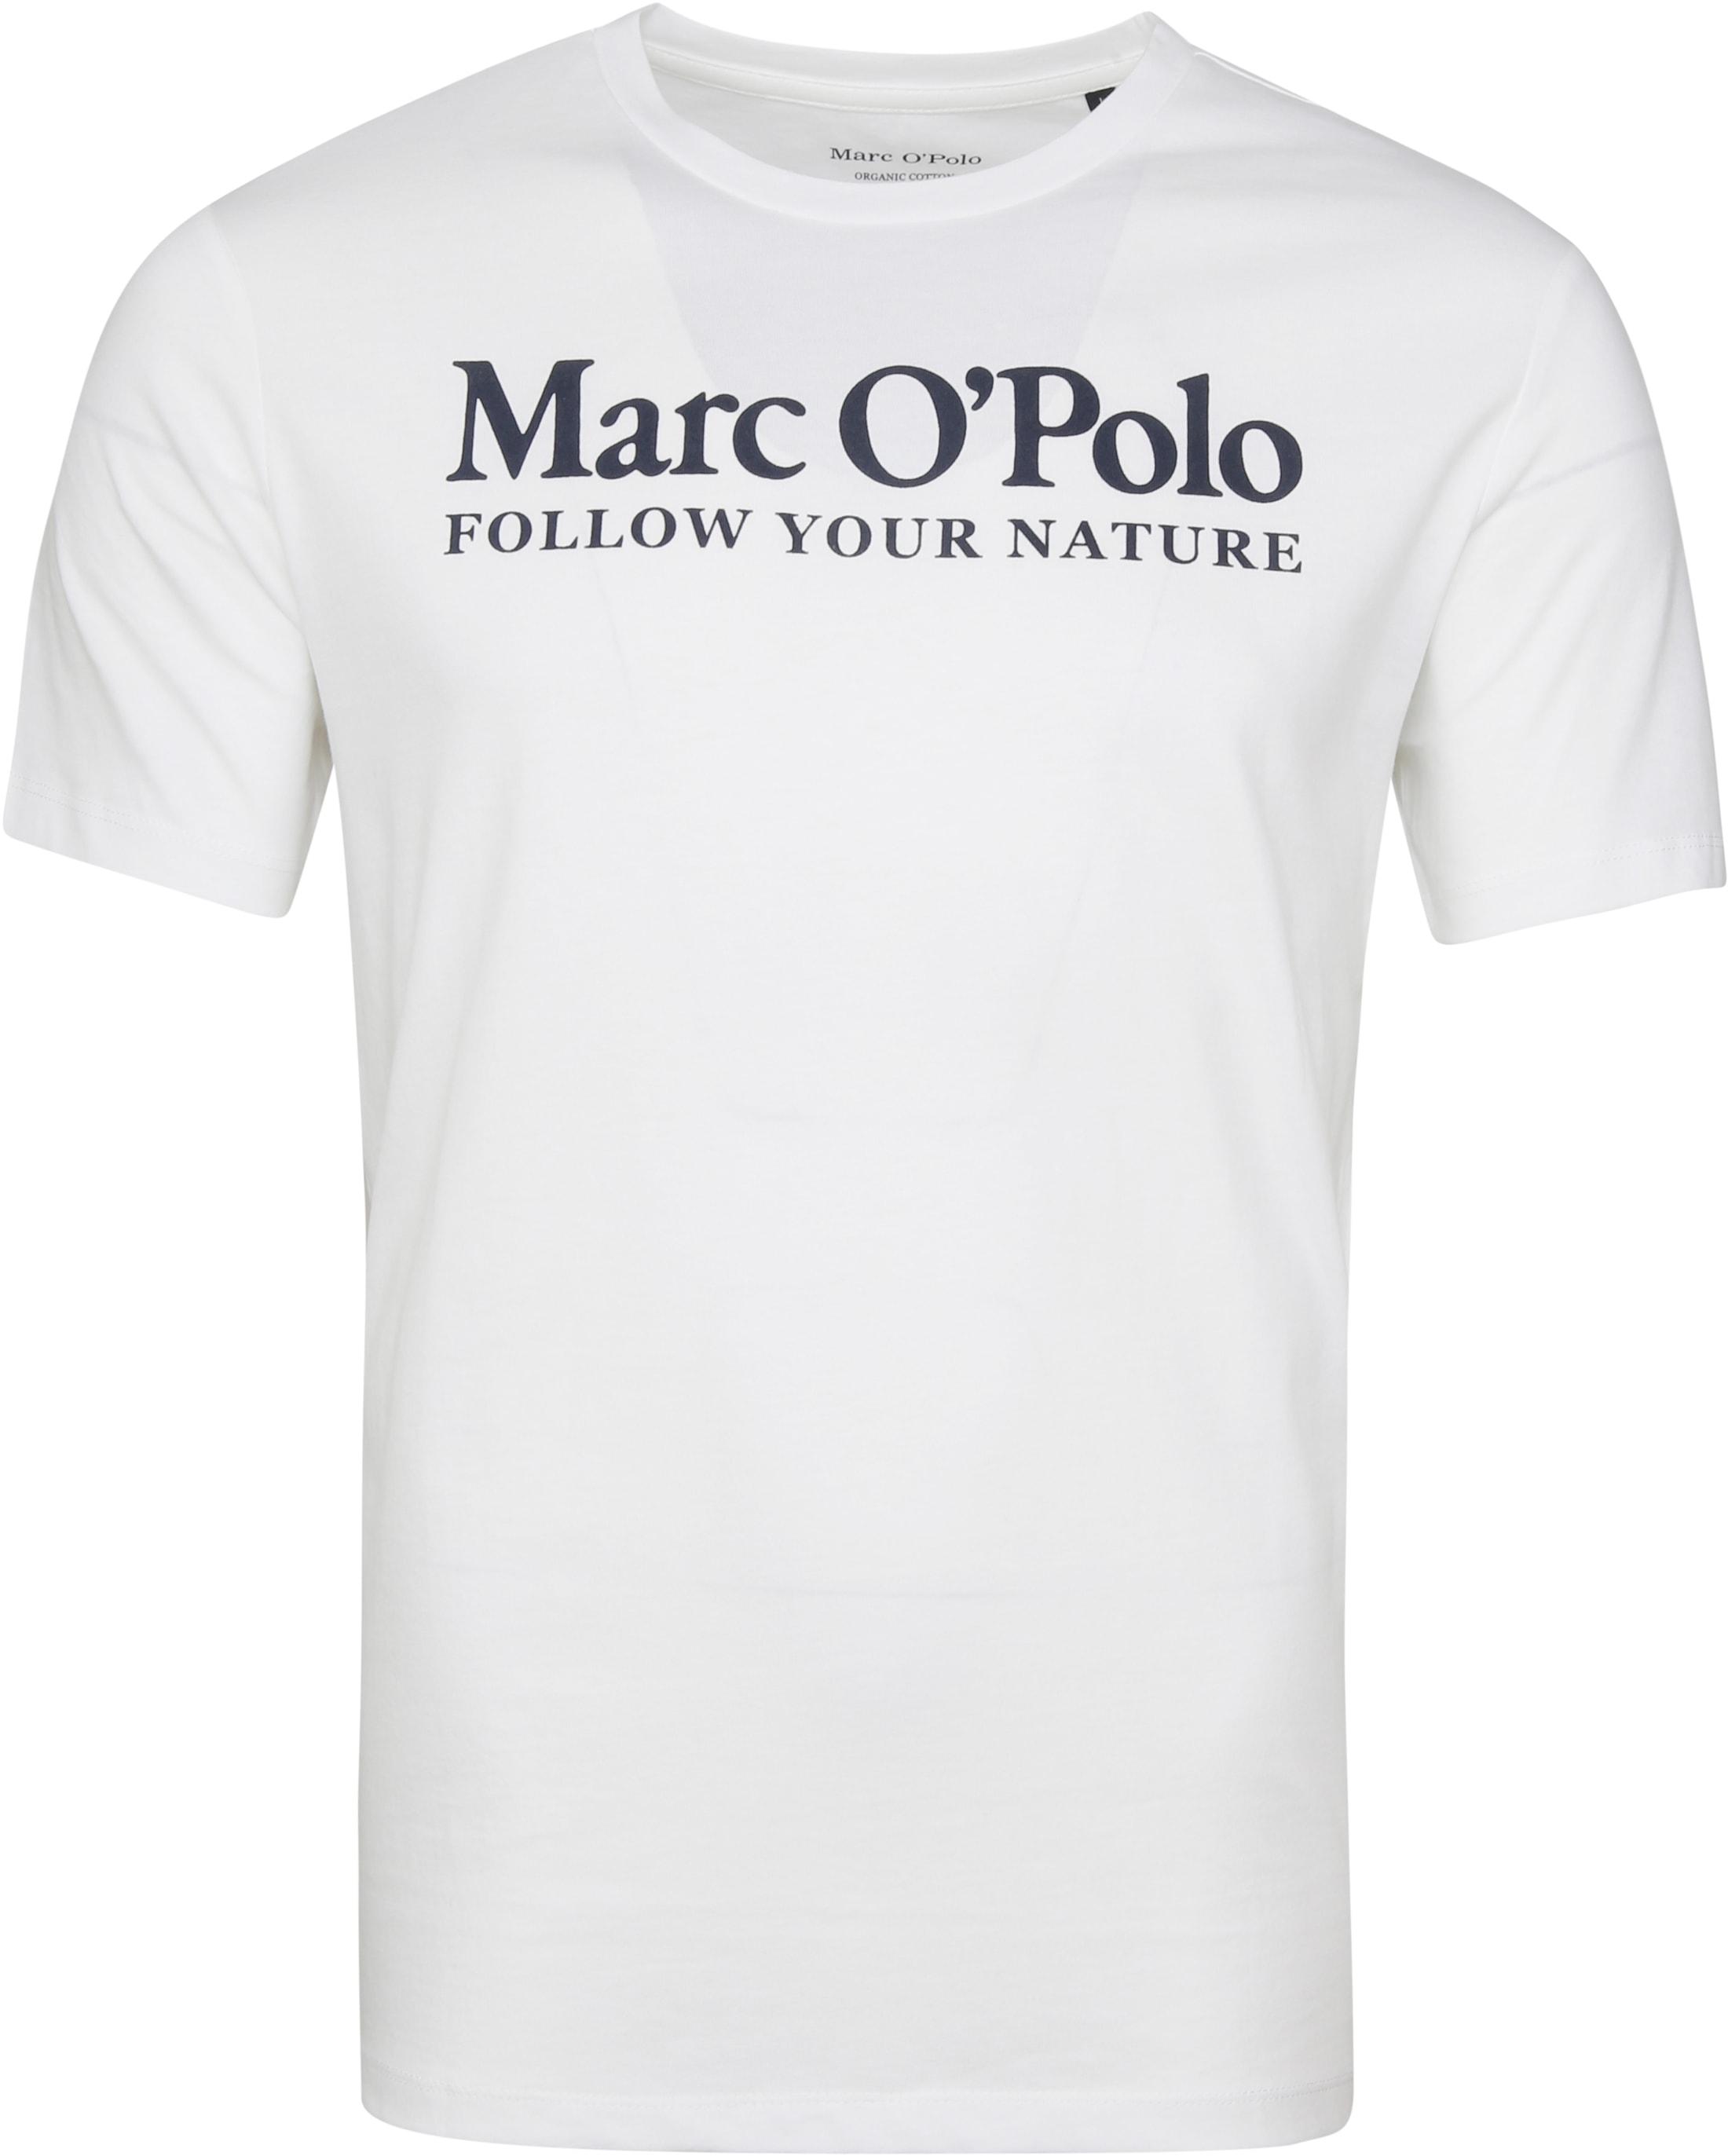 Marc O'Polo T-Shirt Nature White foto 0